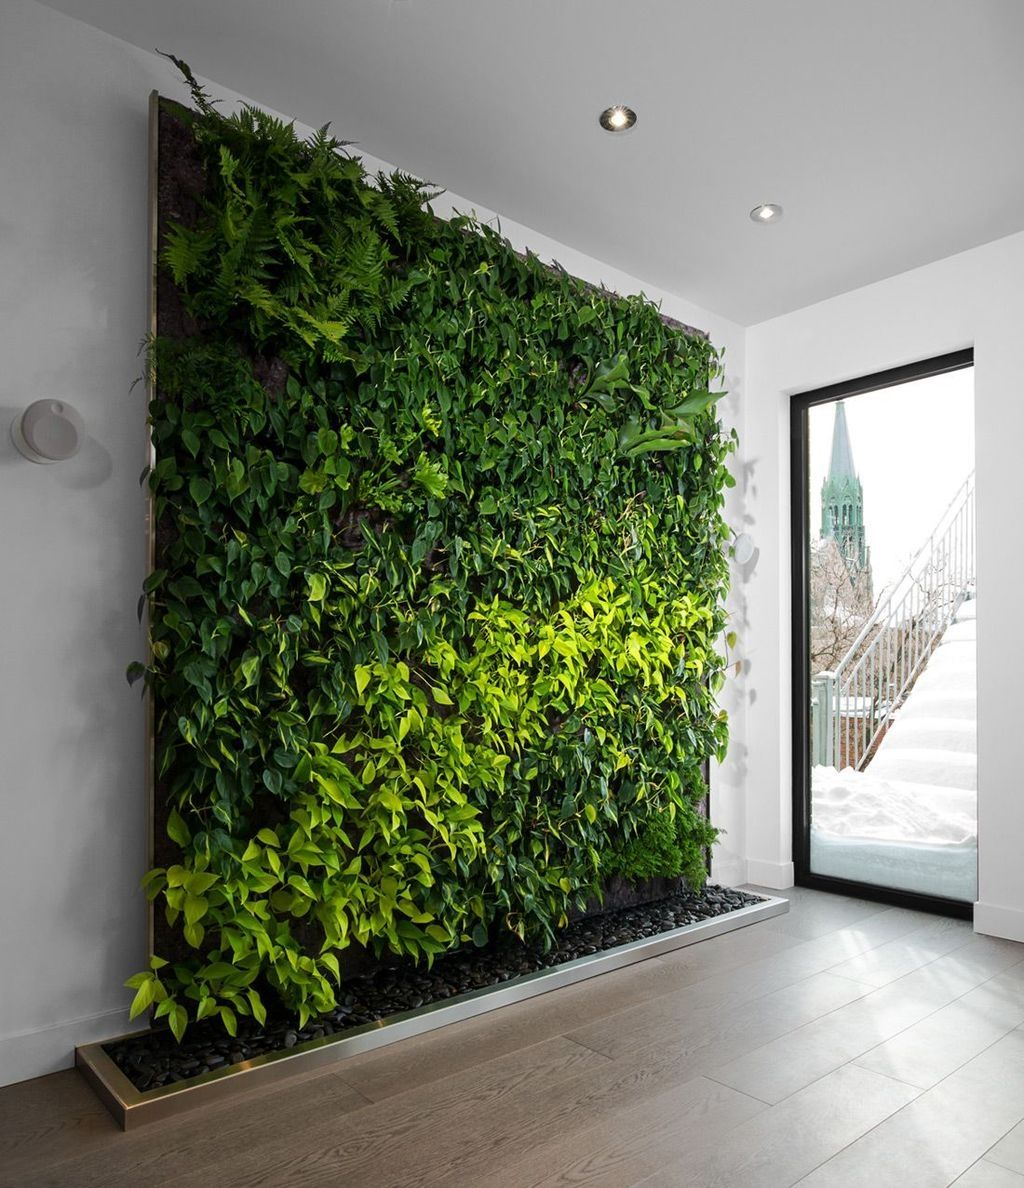 41 Elegant And Minimalist Garden Design Ideas Vertical Garden Indoor Green Wall Garden Vertical Garden Wall